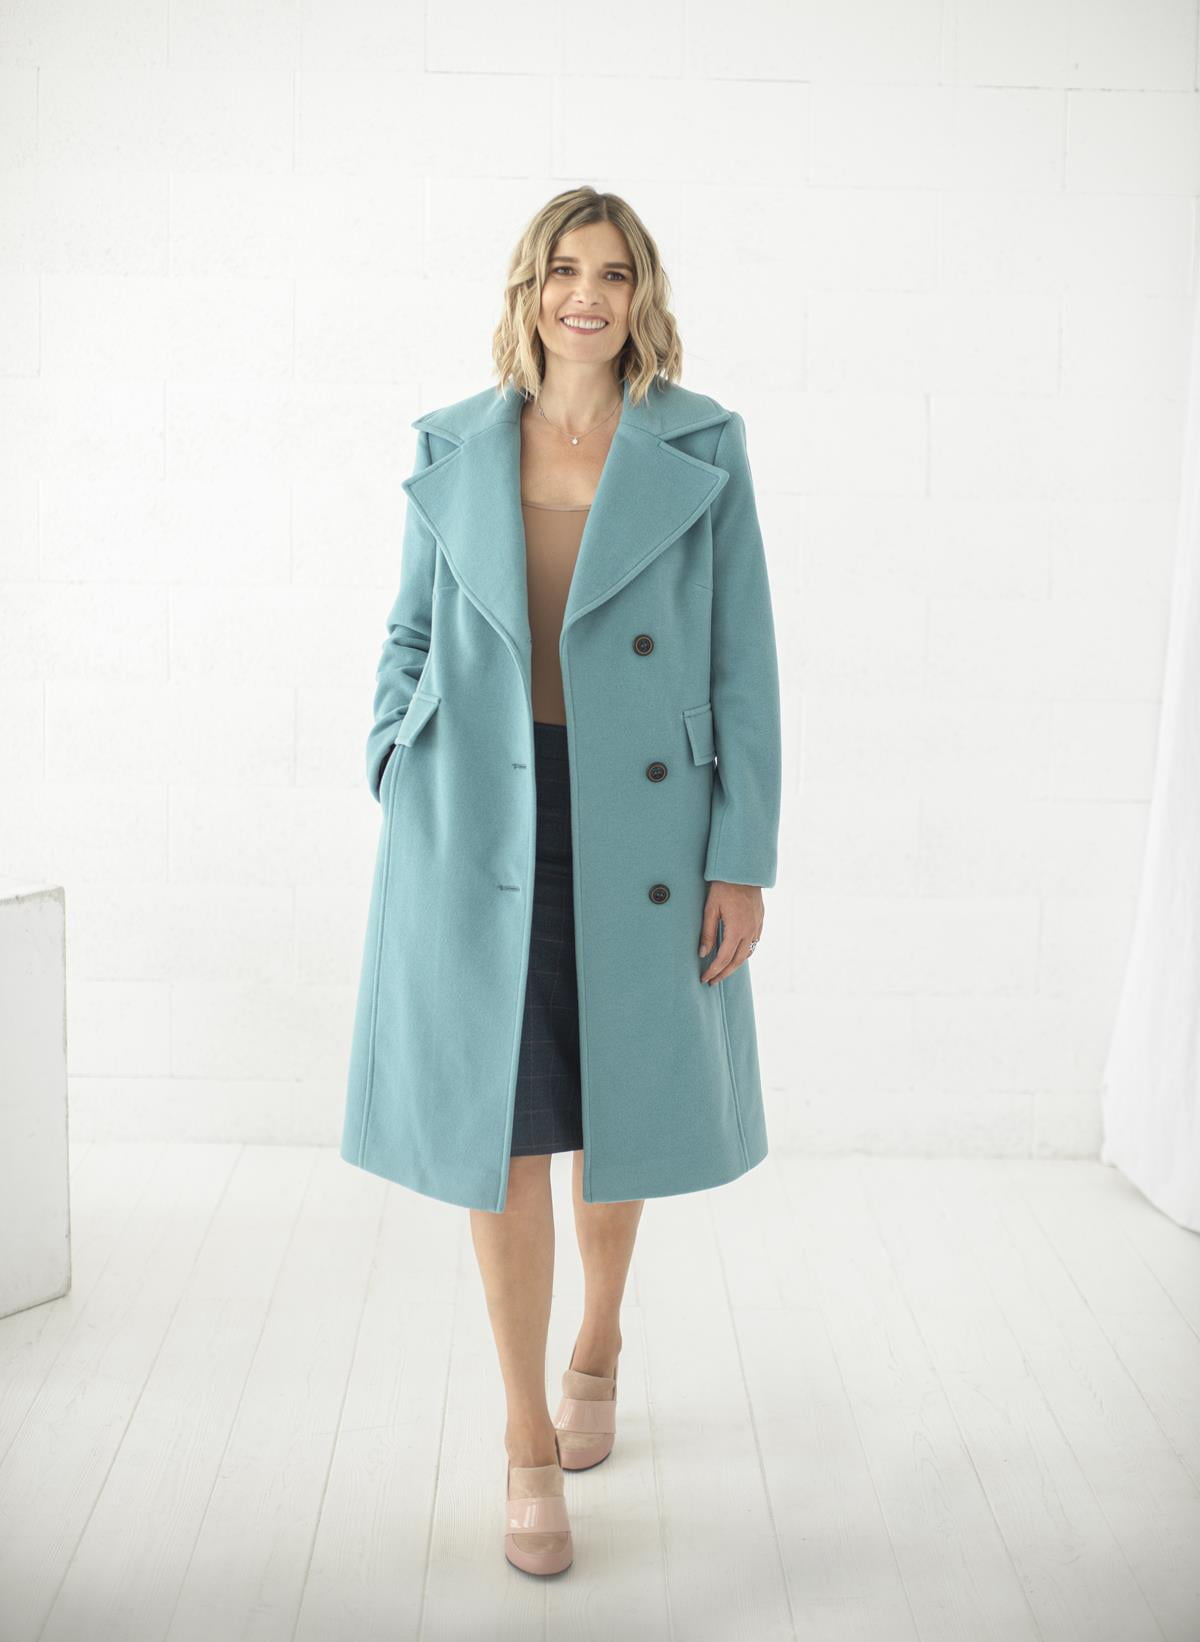 Kašmyro vilnos paltas - My own coat 5 - Tauri Look